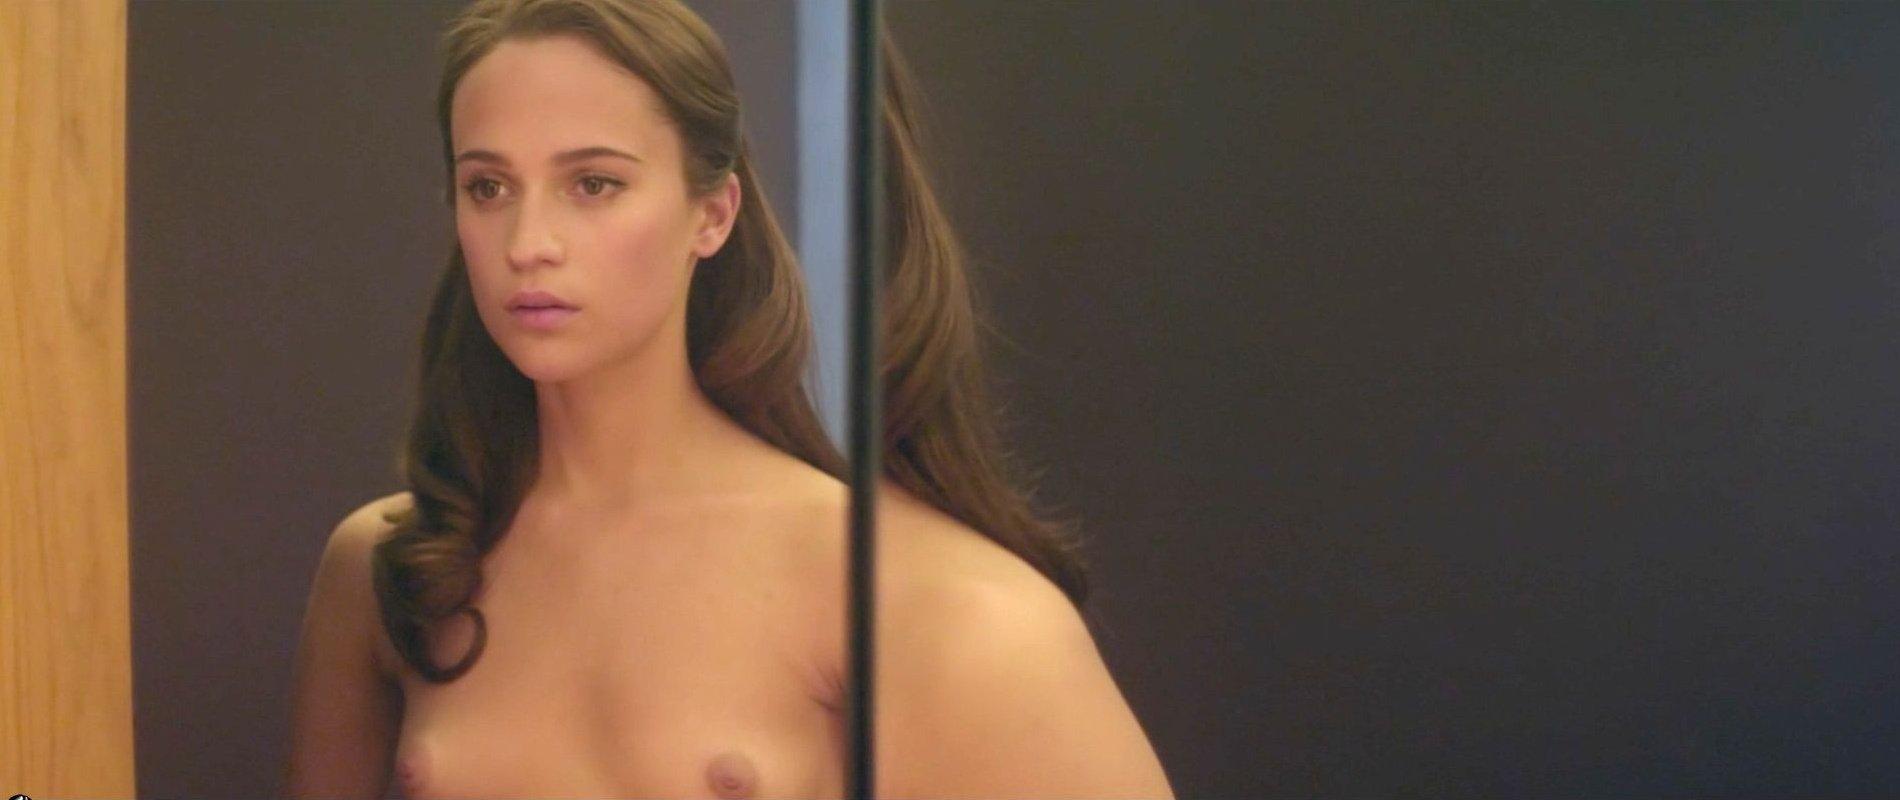 Watching my sister undress